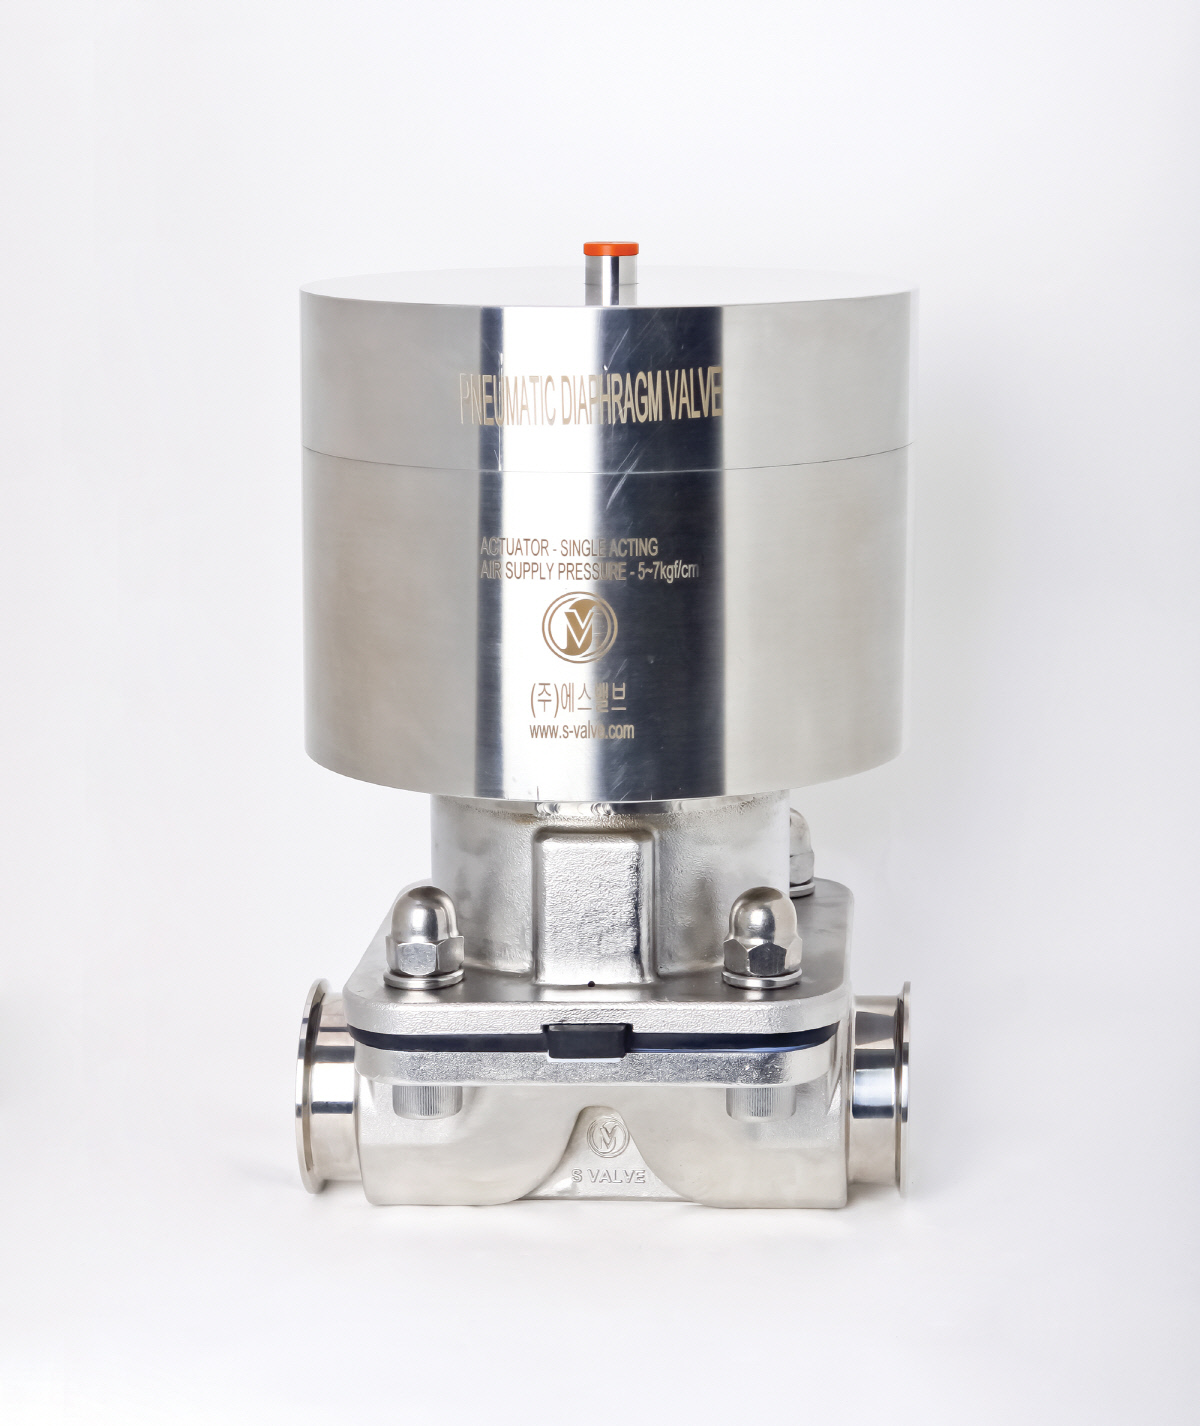 S-valve_0019.jpg